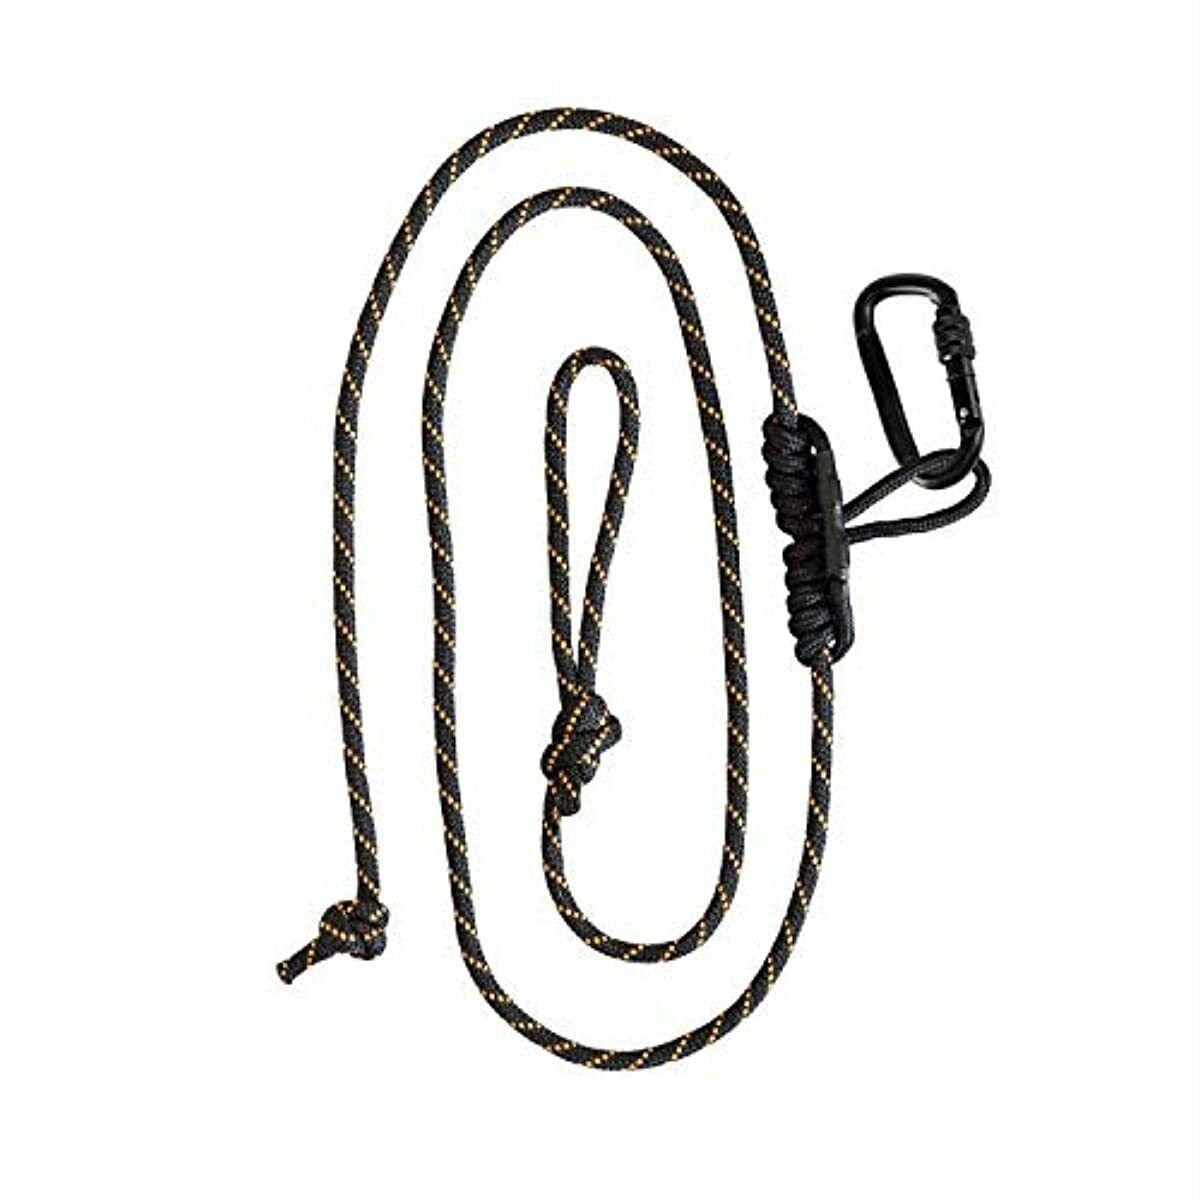 Safety Harness Lineman S Rope Black Orange Travel